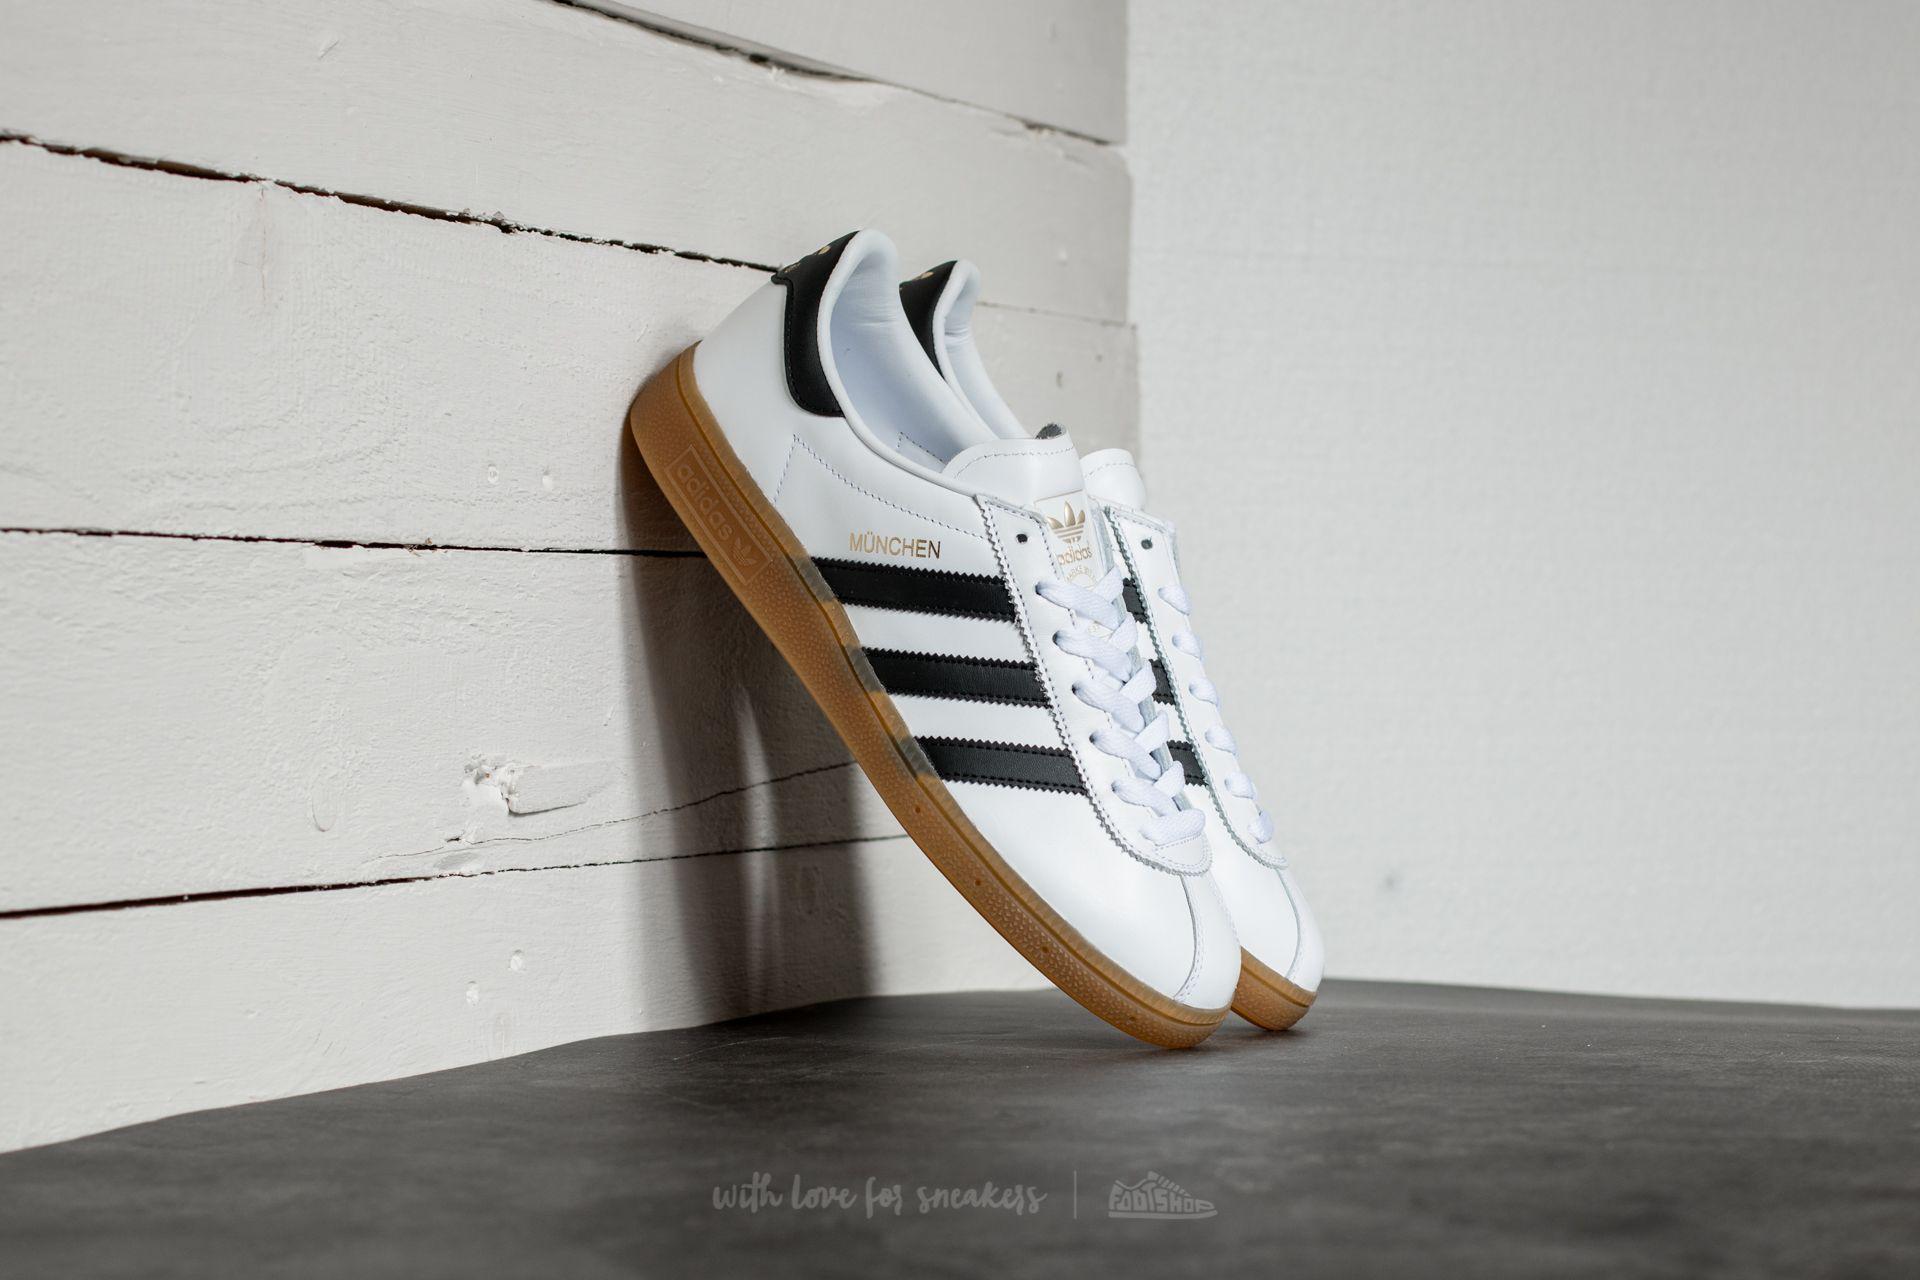 new product e815b d321a adidas Originals Adidas Munchen Ftw White  Core Black  Gum for Men ...